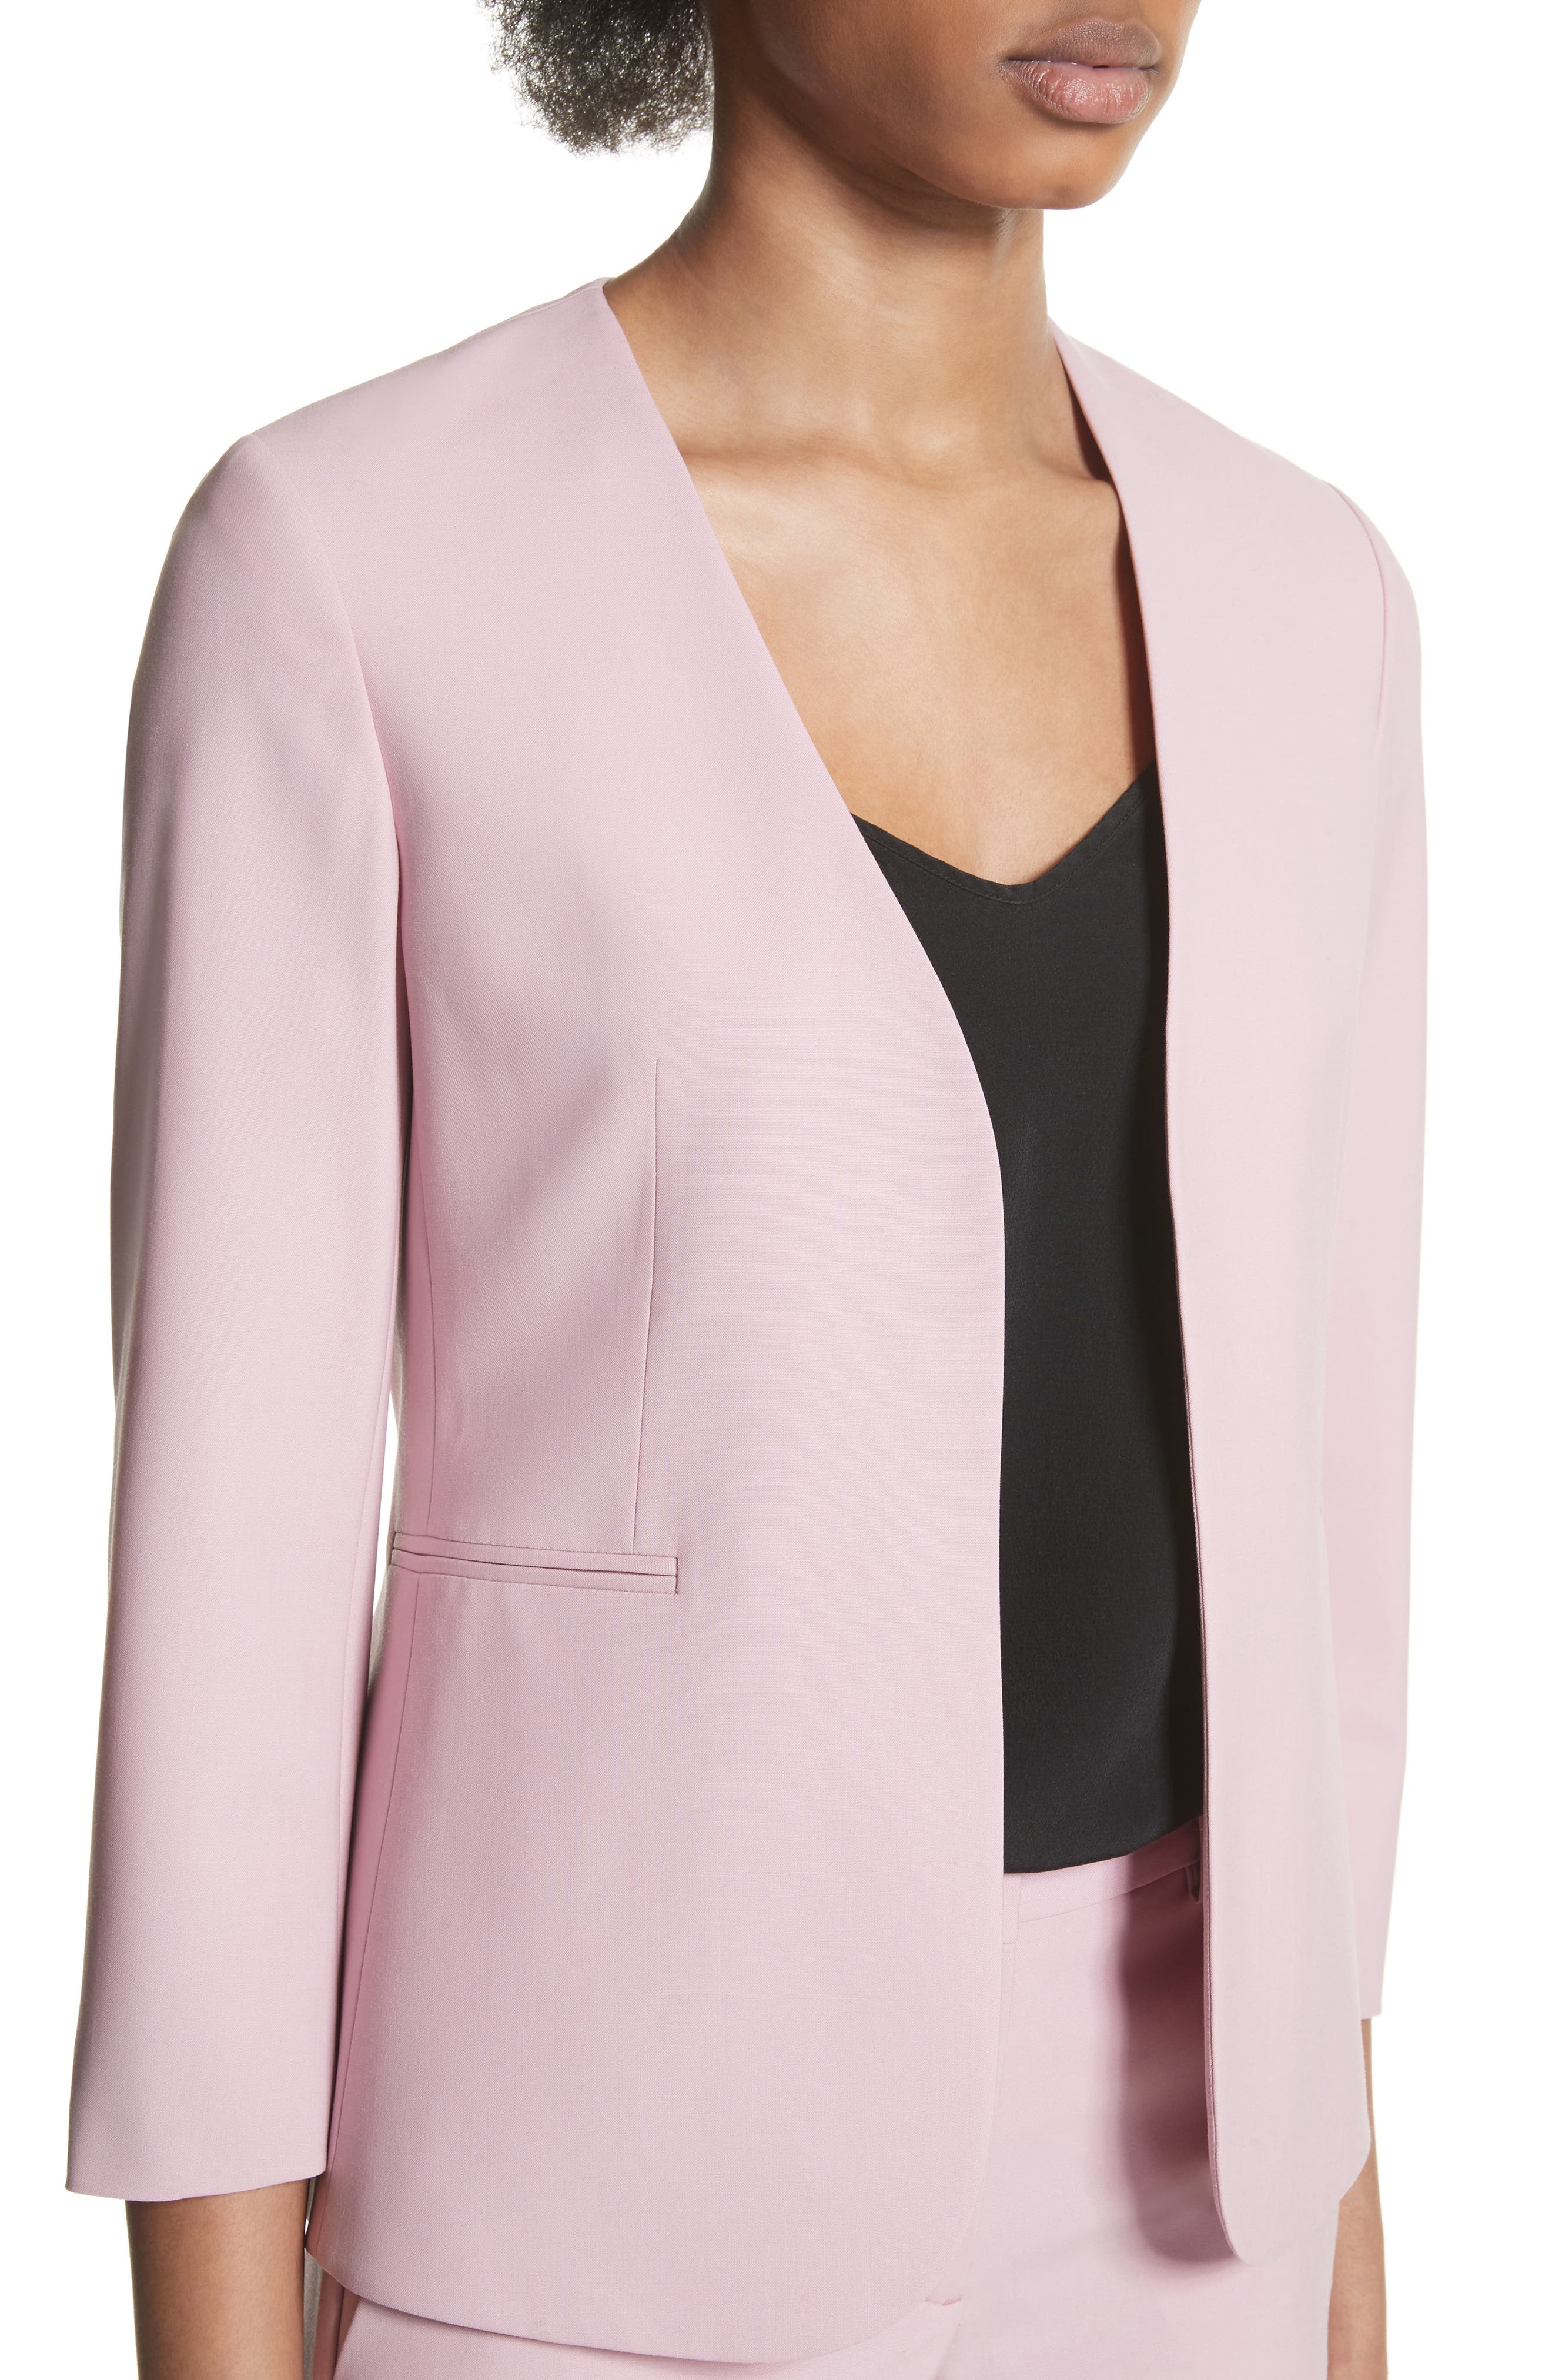 Lindrayia B Good Wool Suit Jacket,                             Alternate thumbnail 4, color,                             655